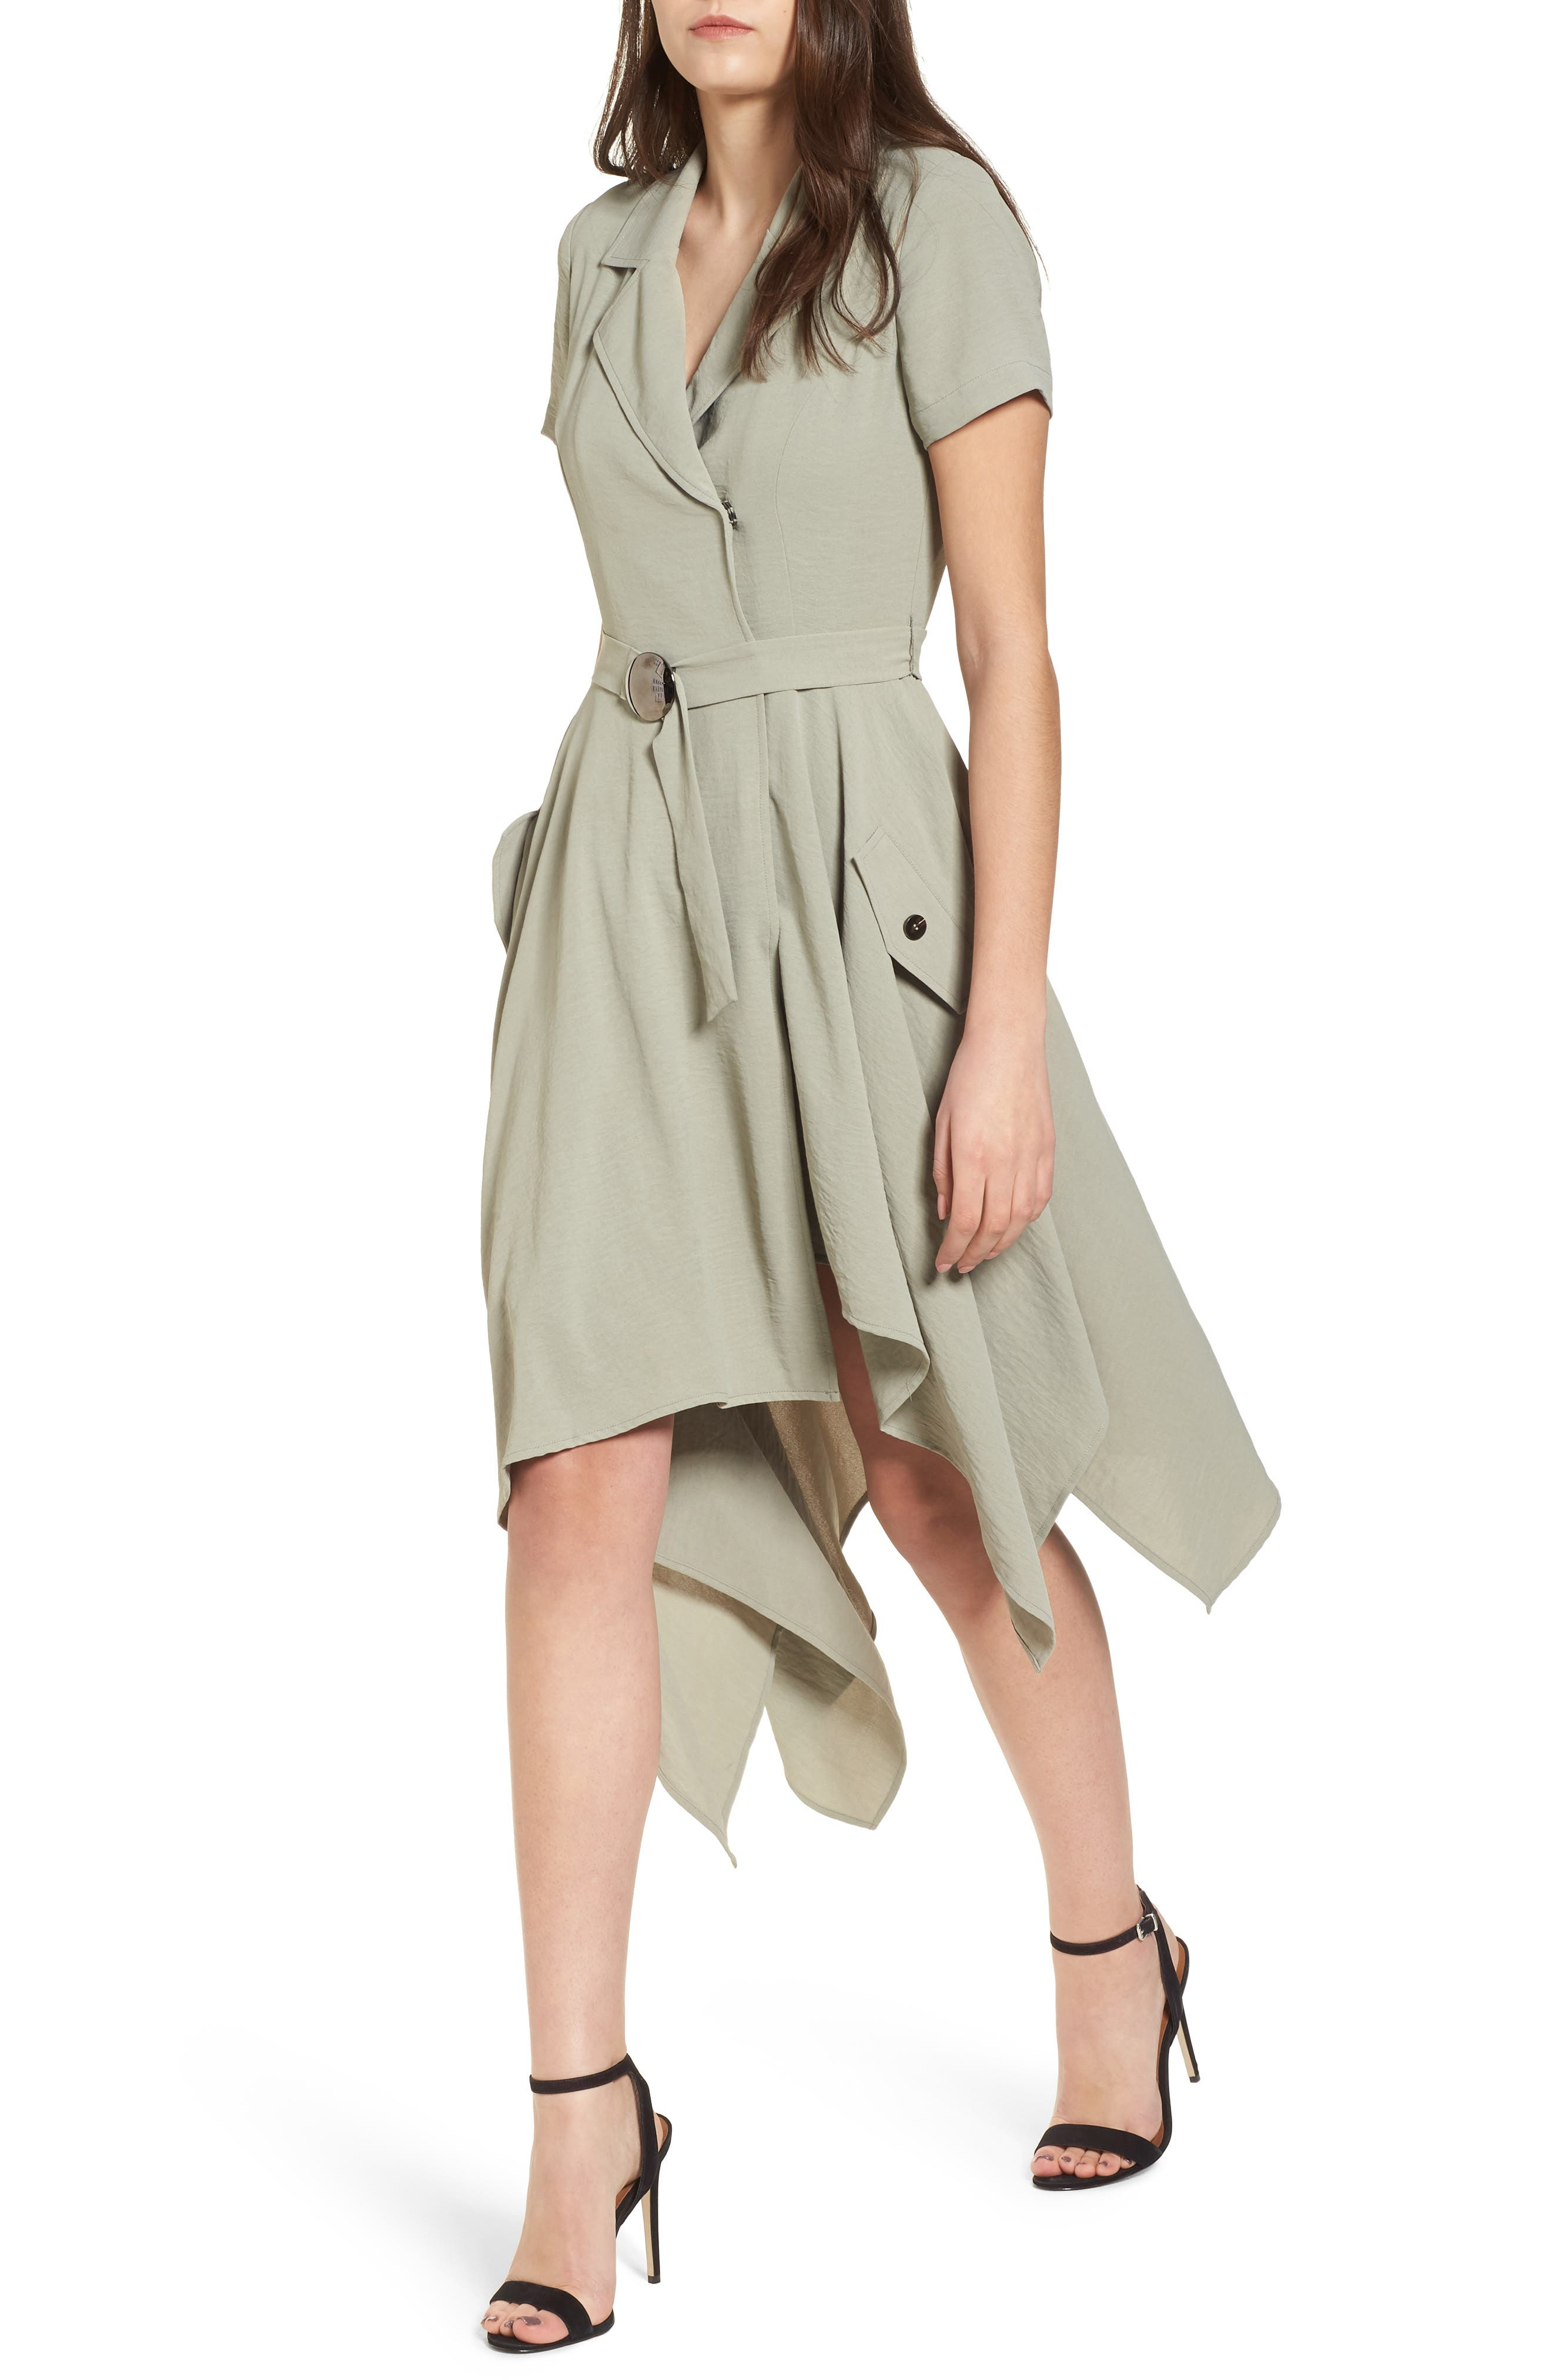 Chriselle x J.O.A. Asymmetrical Trench Dress,                             Main thumbnail 1, color,                             300